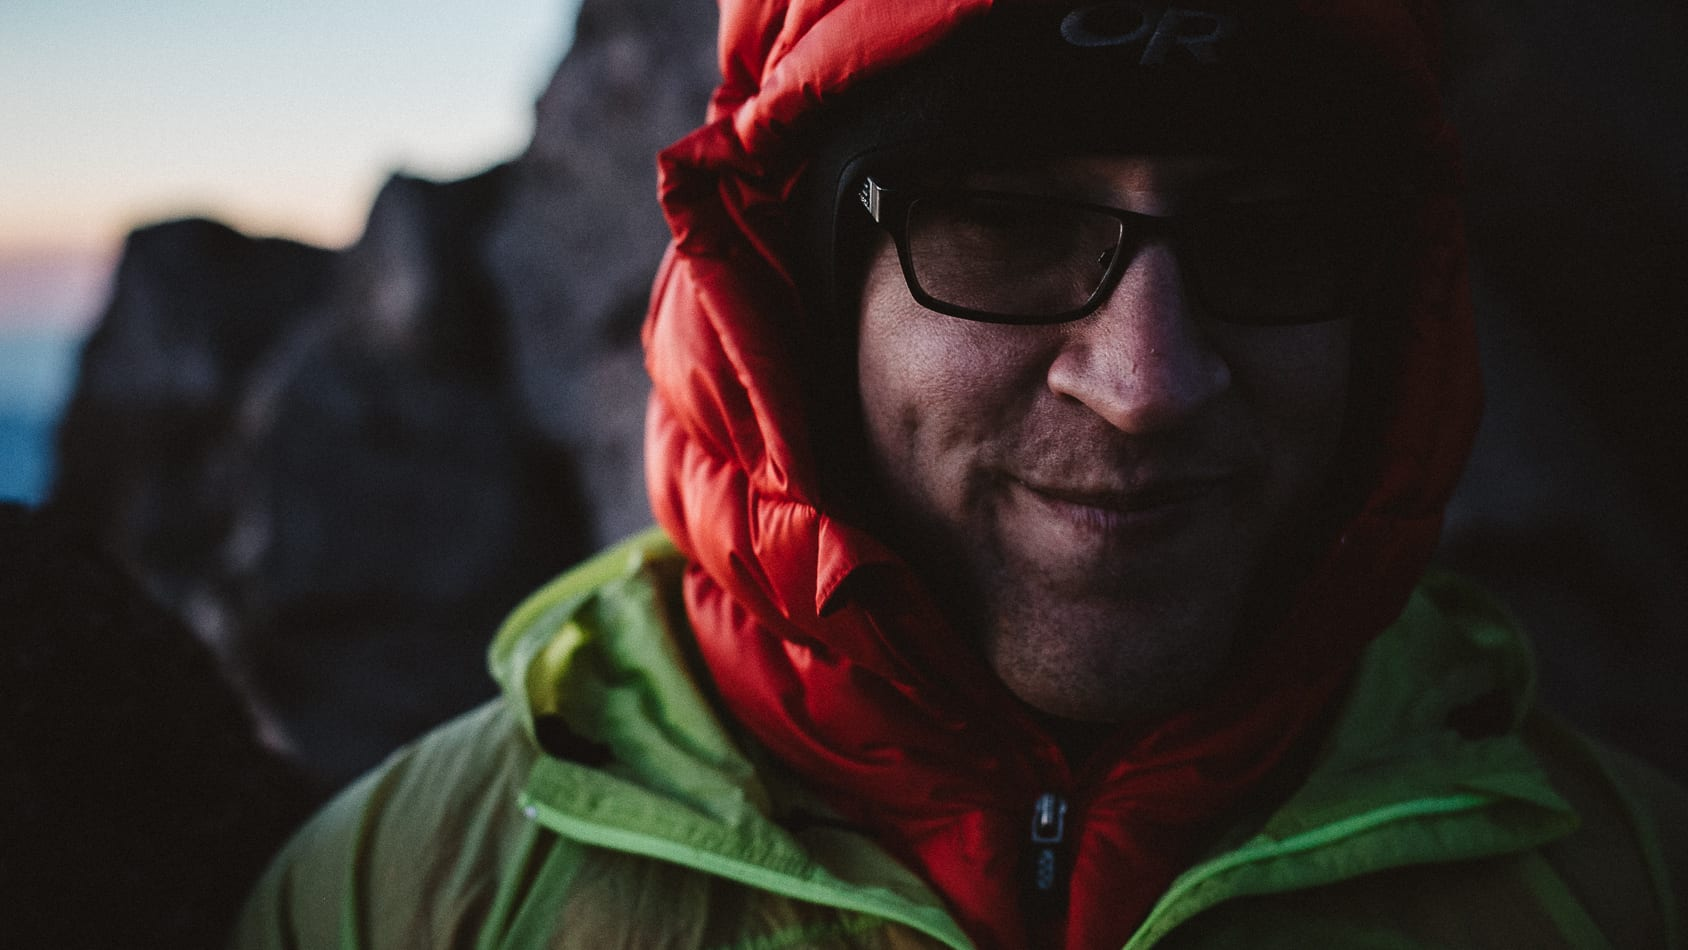 mount-lassen-california-adventure-lifestyle-photorapher-38